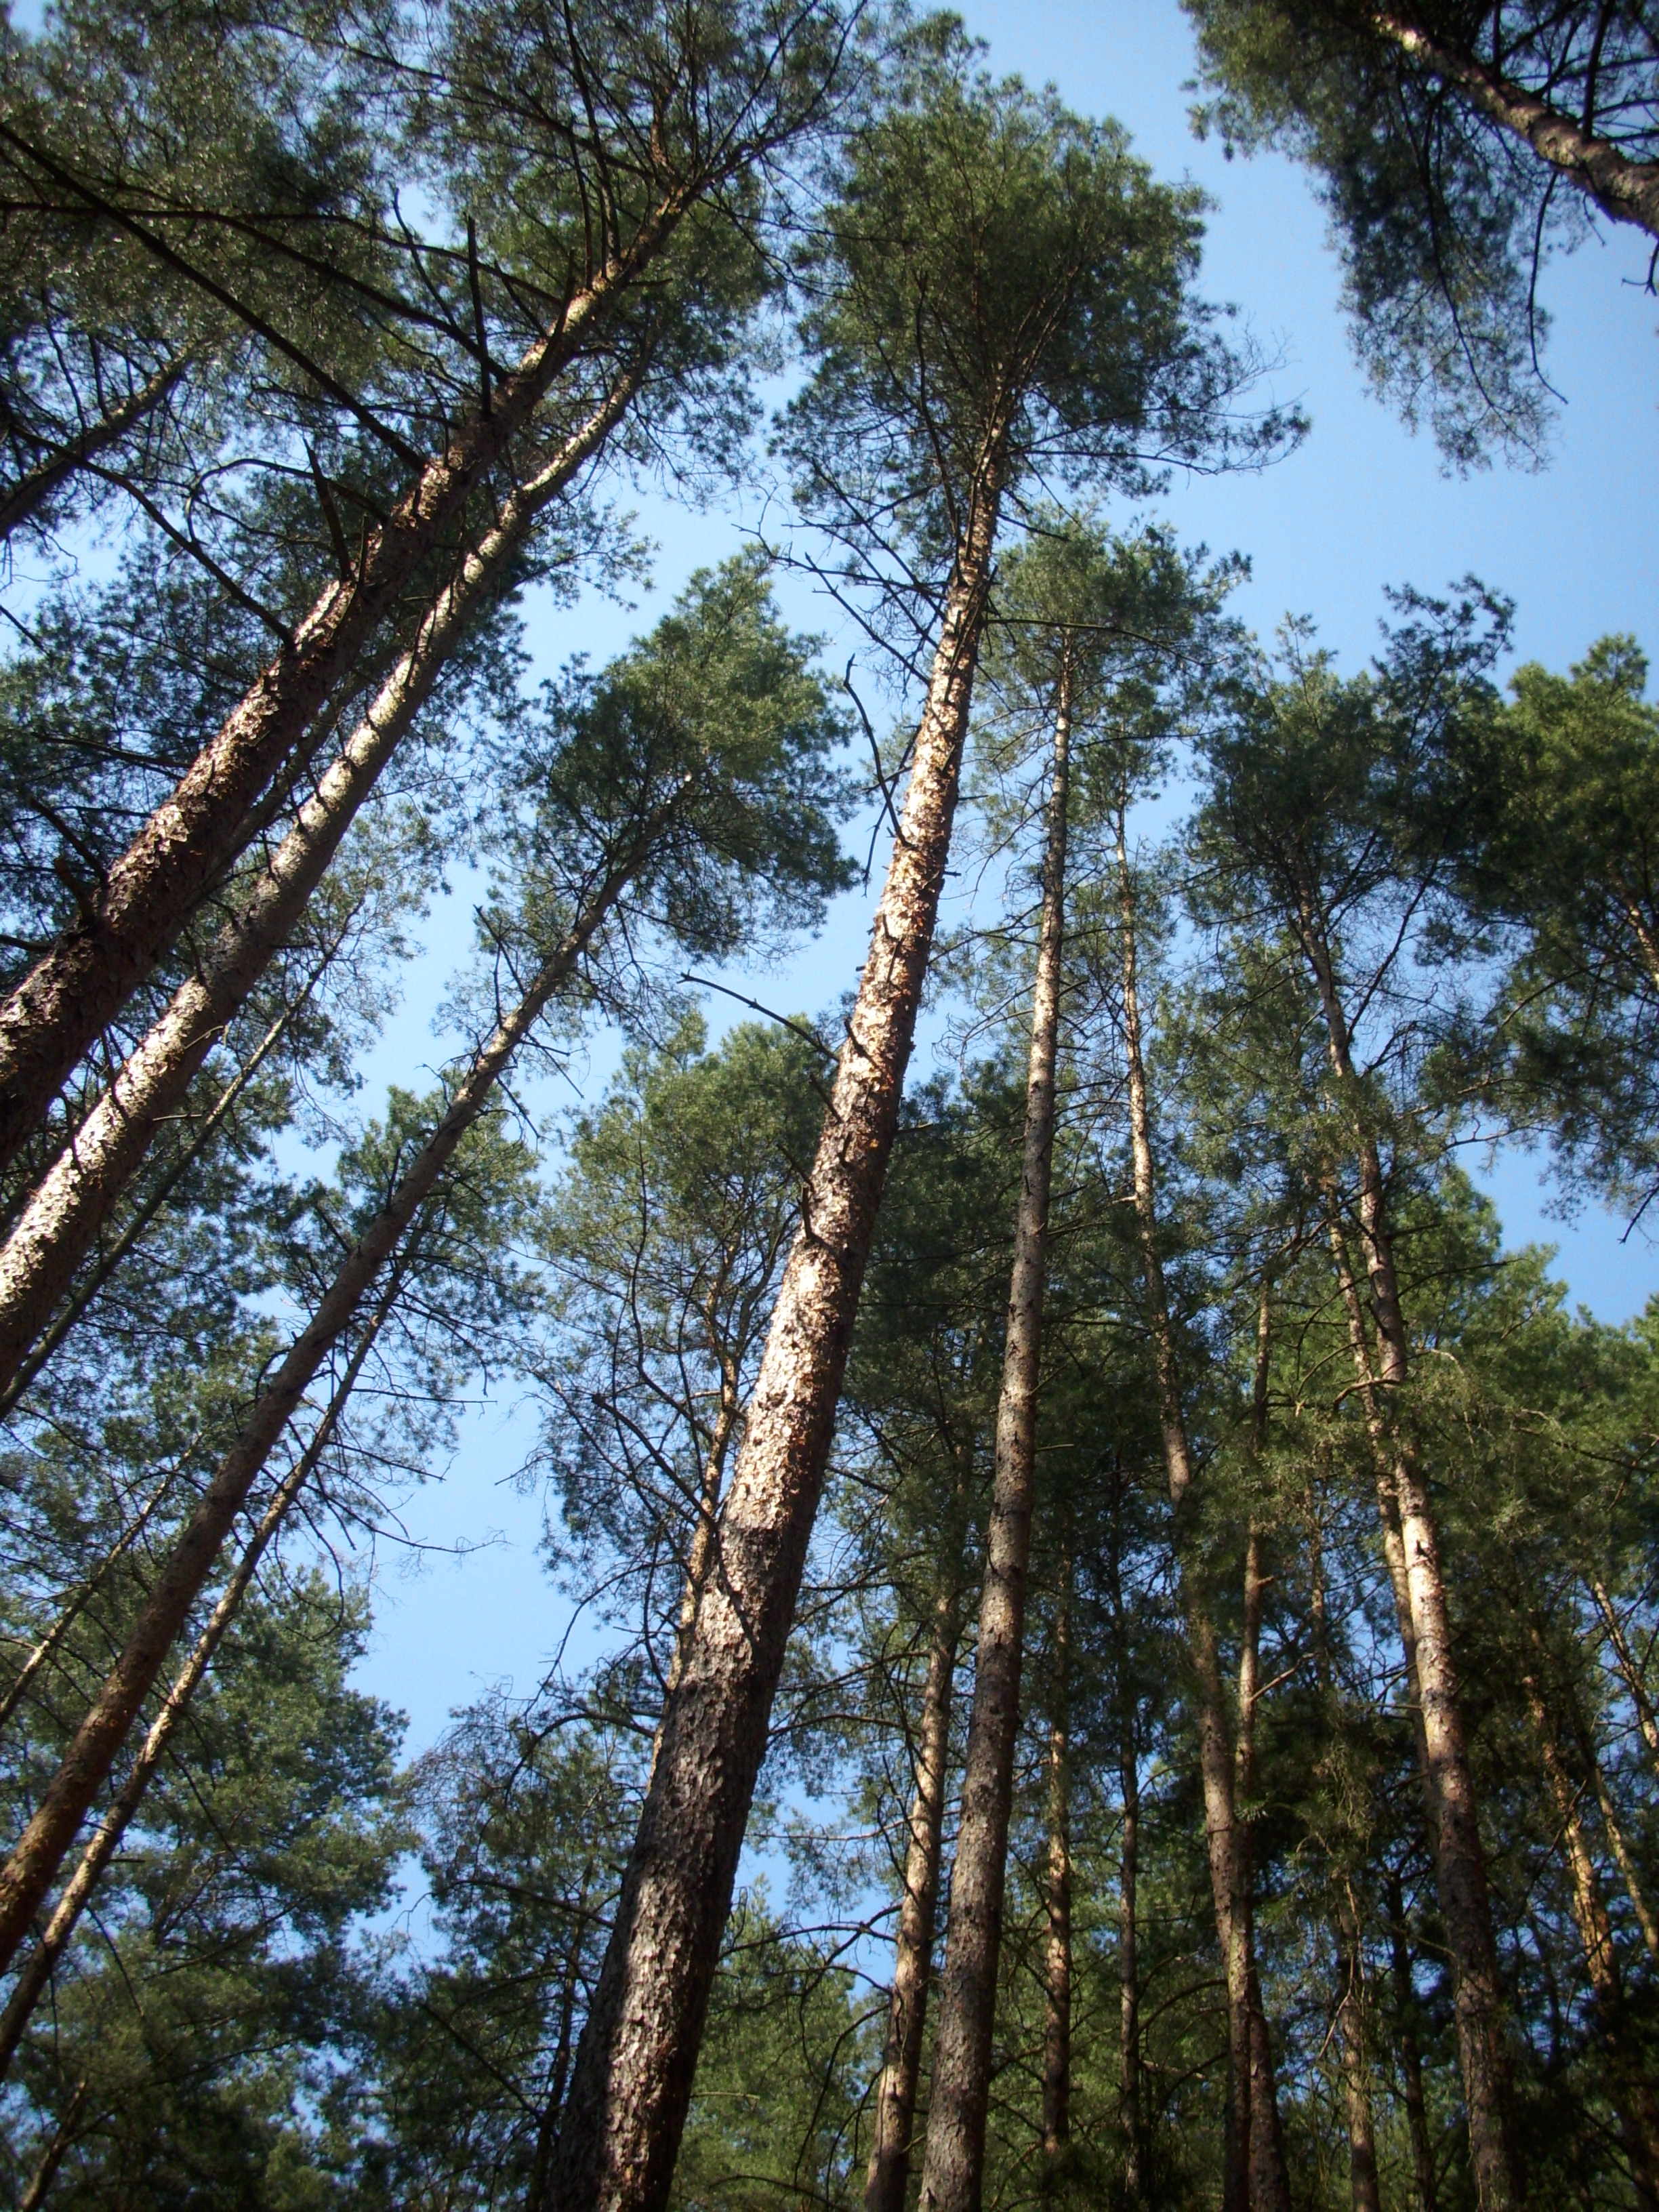 http://upload.wikimedia.org/wikipedia/commons/3/3f/Trees_in_woods,_Czech_republic.jpg